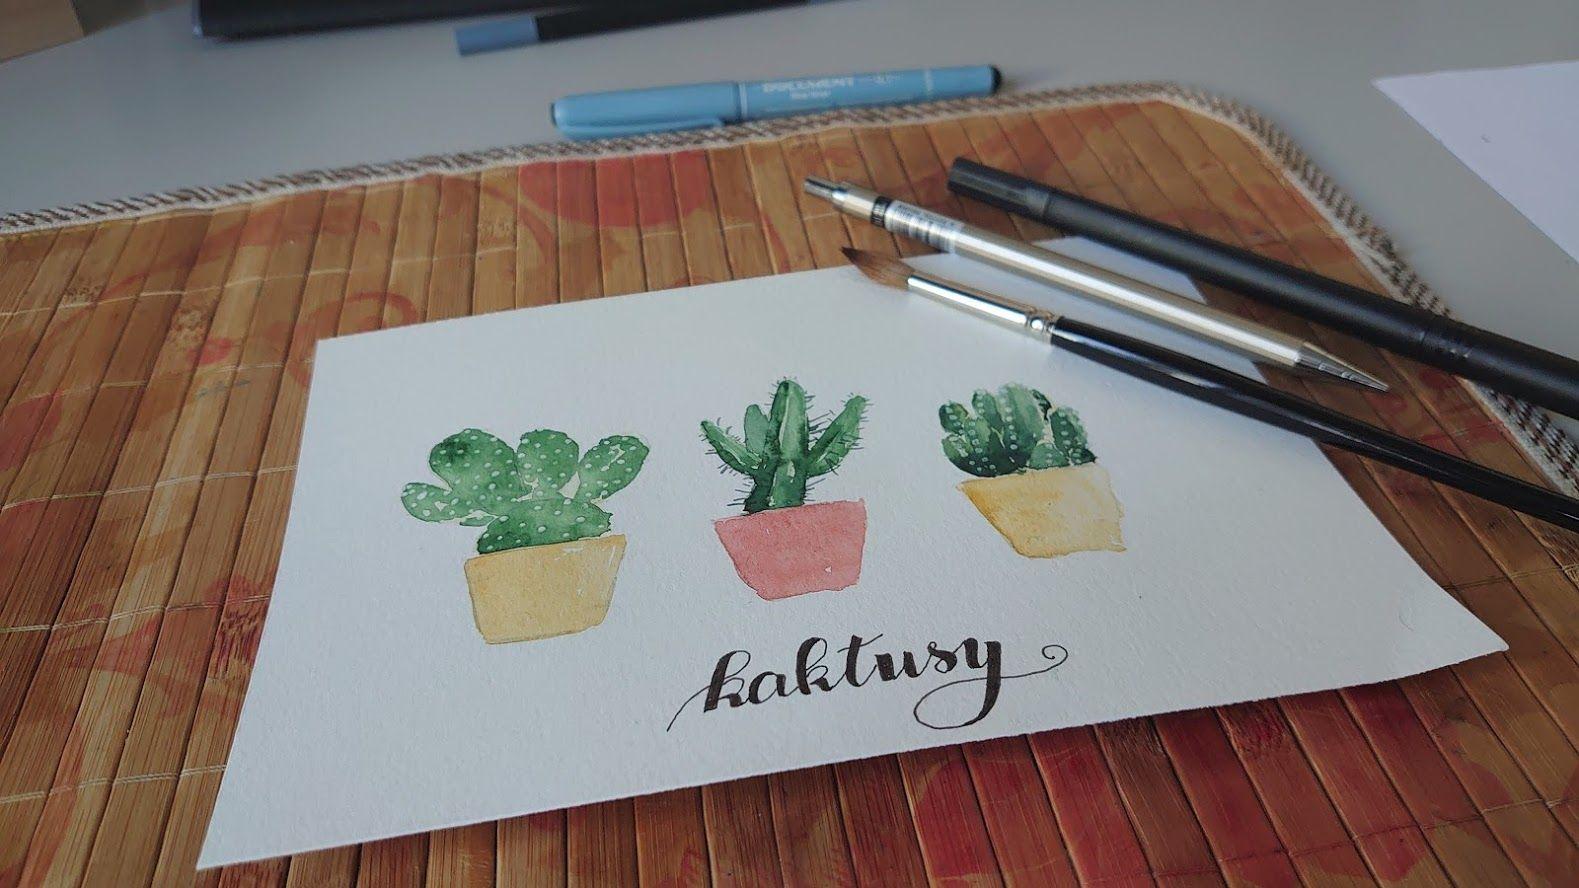 Kaktusy 1 - A